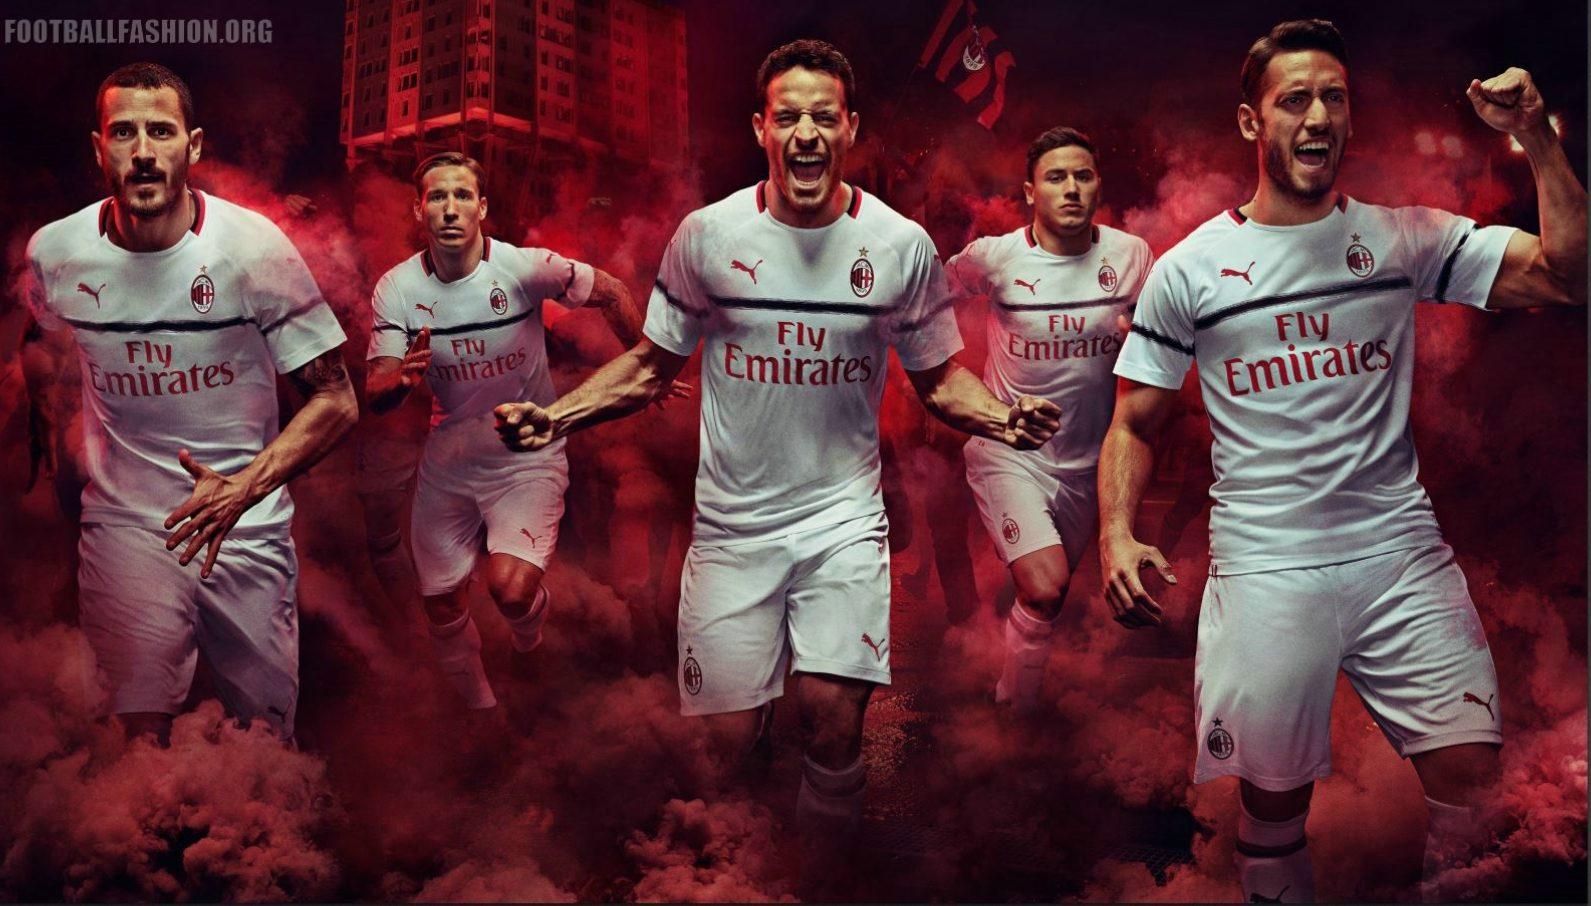 4a1f5601f AC Milan 2018 19 PUMA Away Kit - FOOTBALL FASHION.ORG